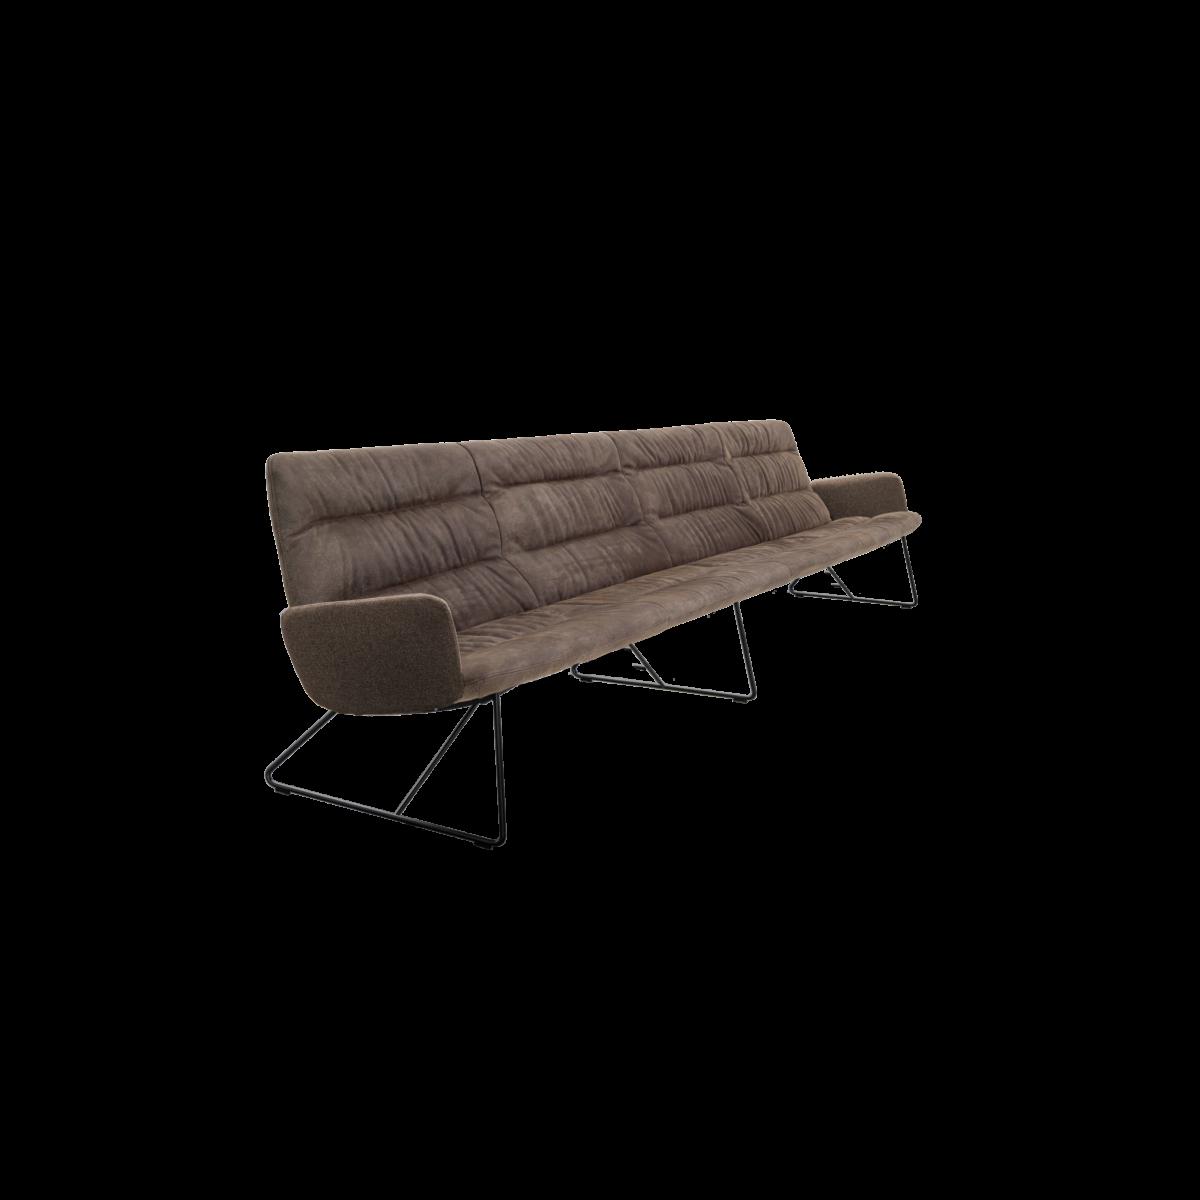 ARVA LIGHT LOUNGE 4er bench kuf mA pol KFF  2 1200x1200 - Bancheta Arva Light KFF